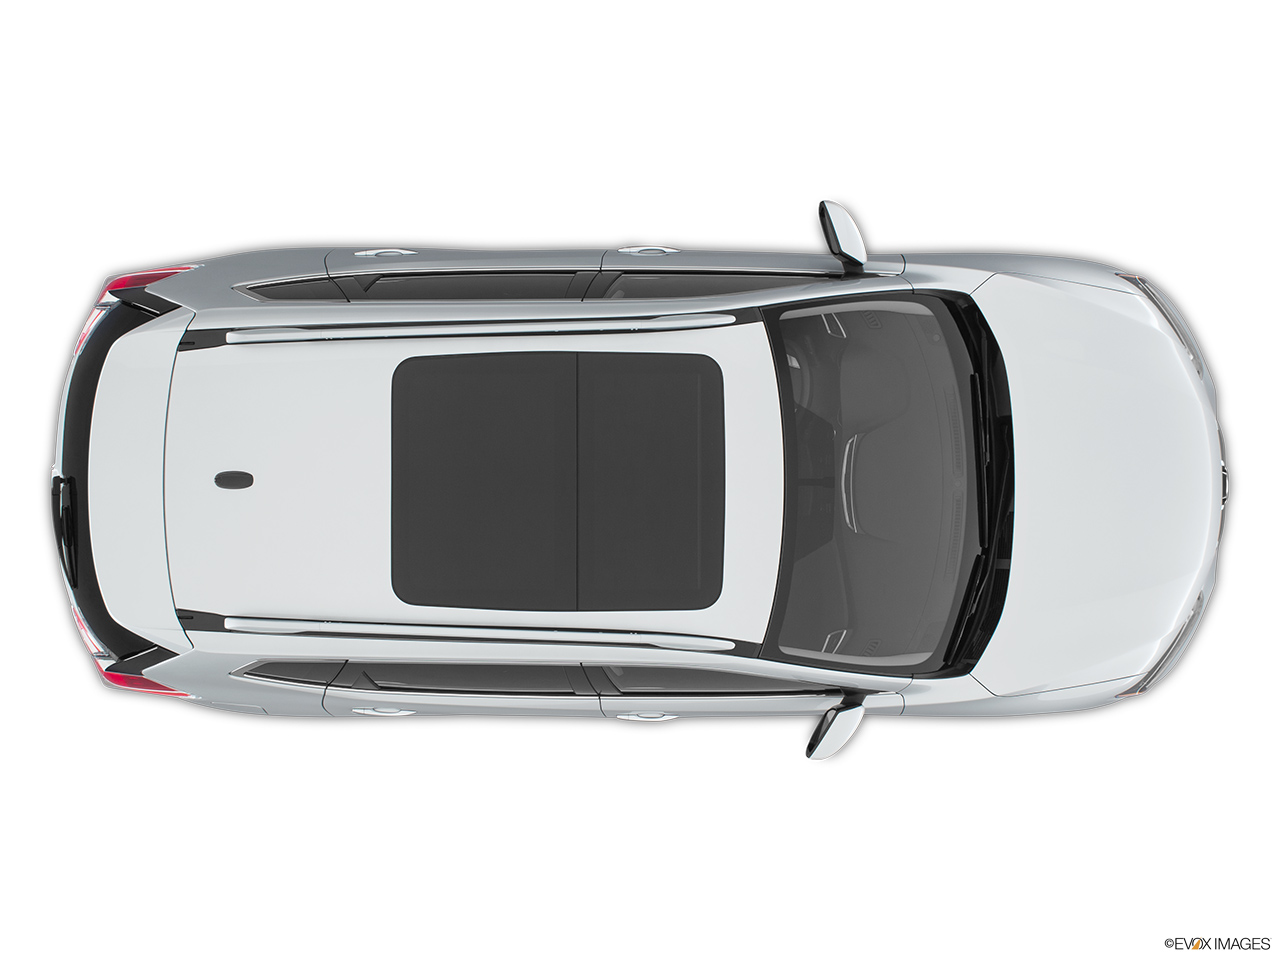 2015 Nissan Rogue Awd 4 Door Sv Overhead